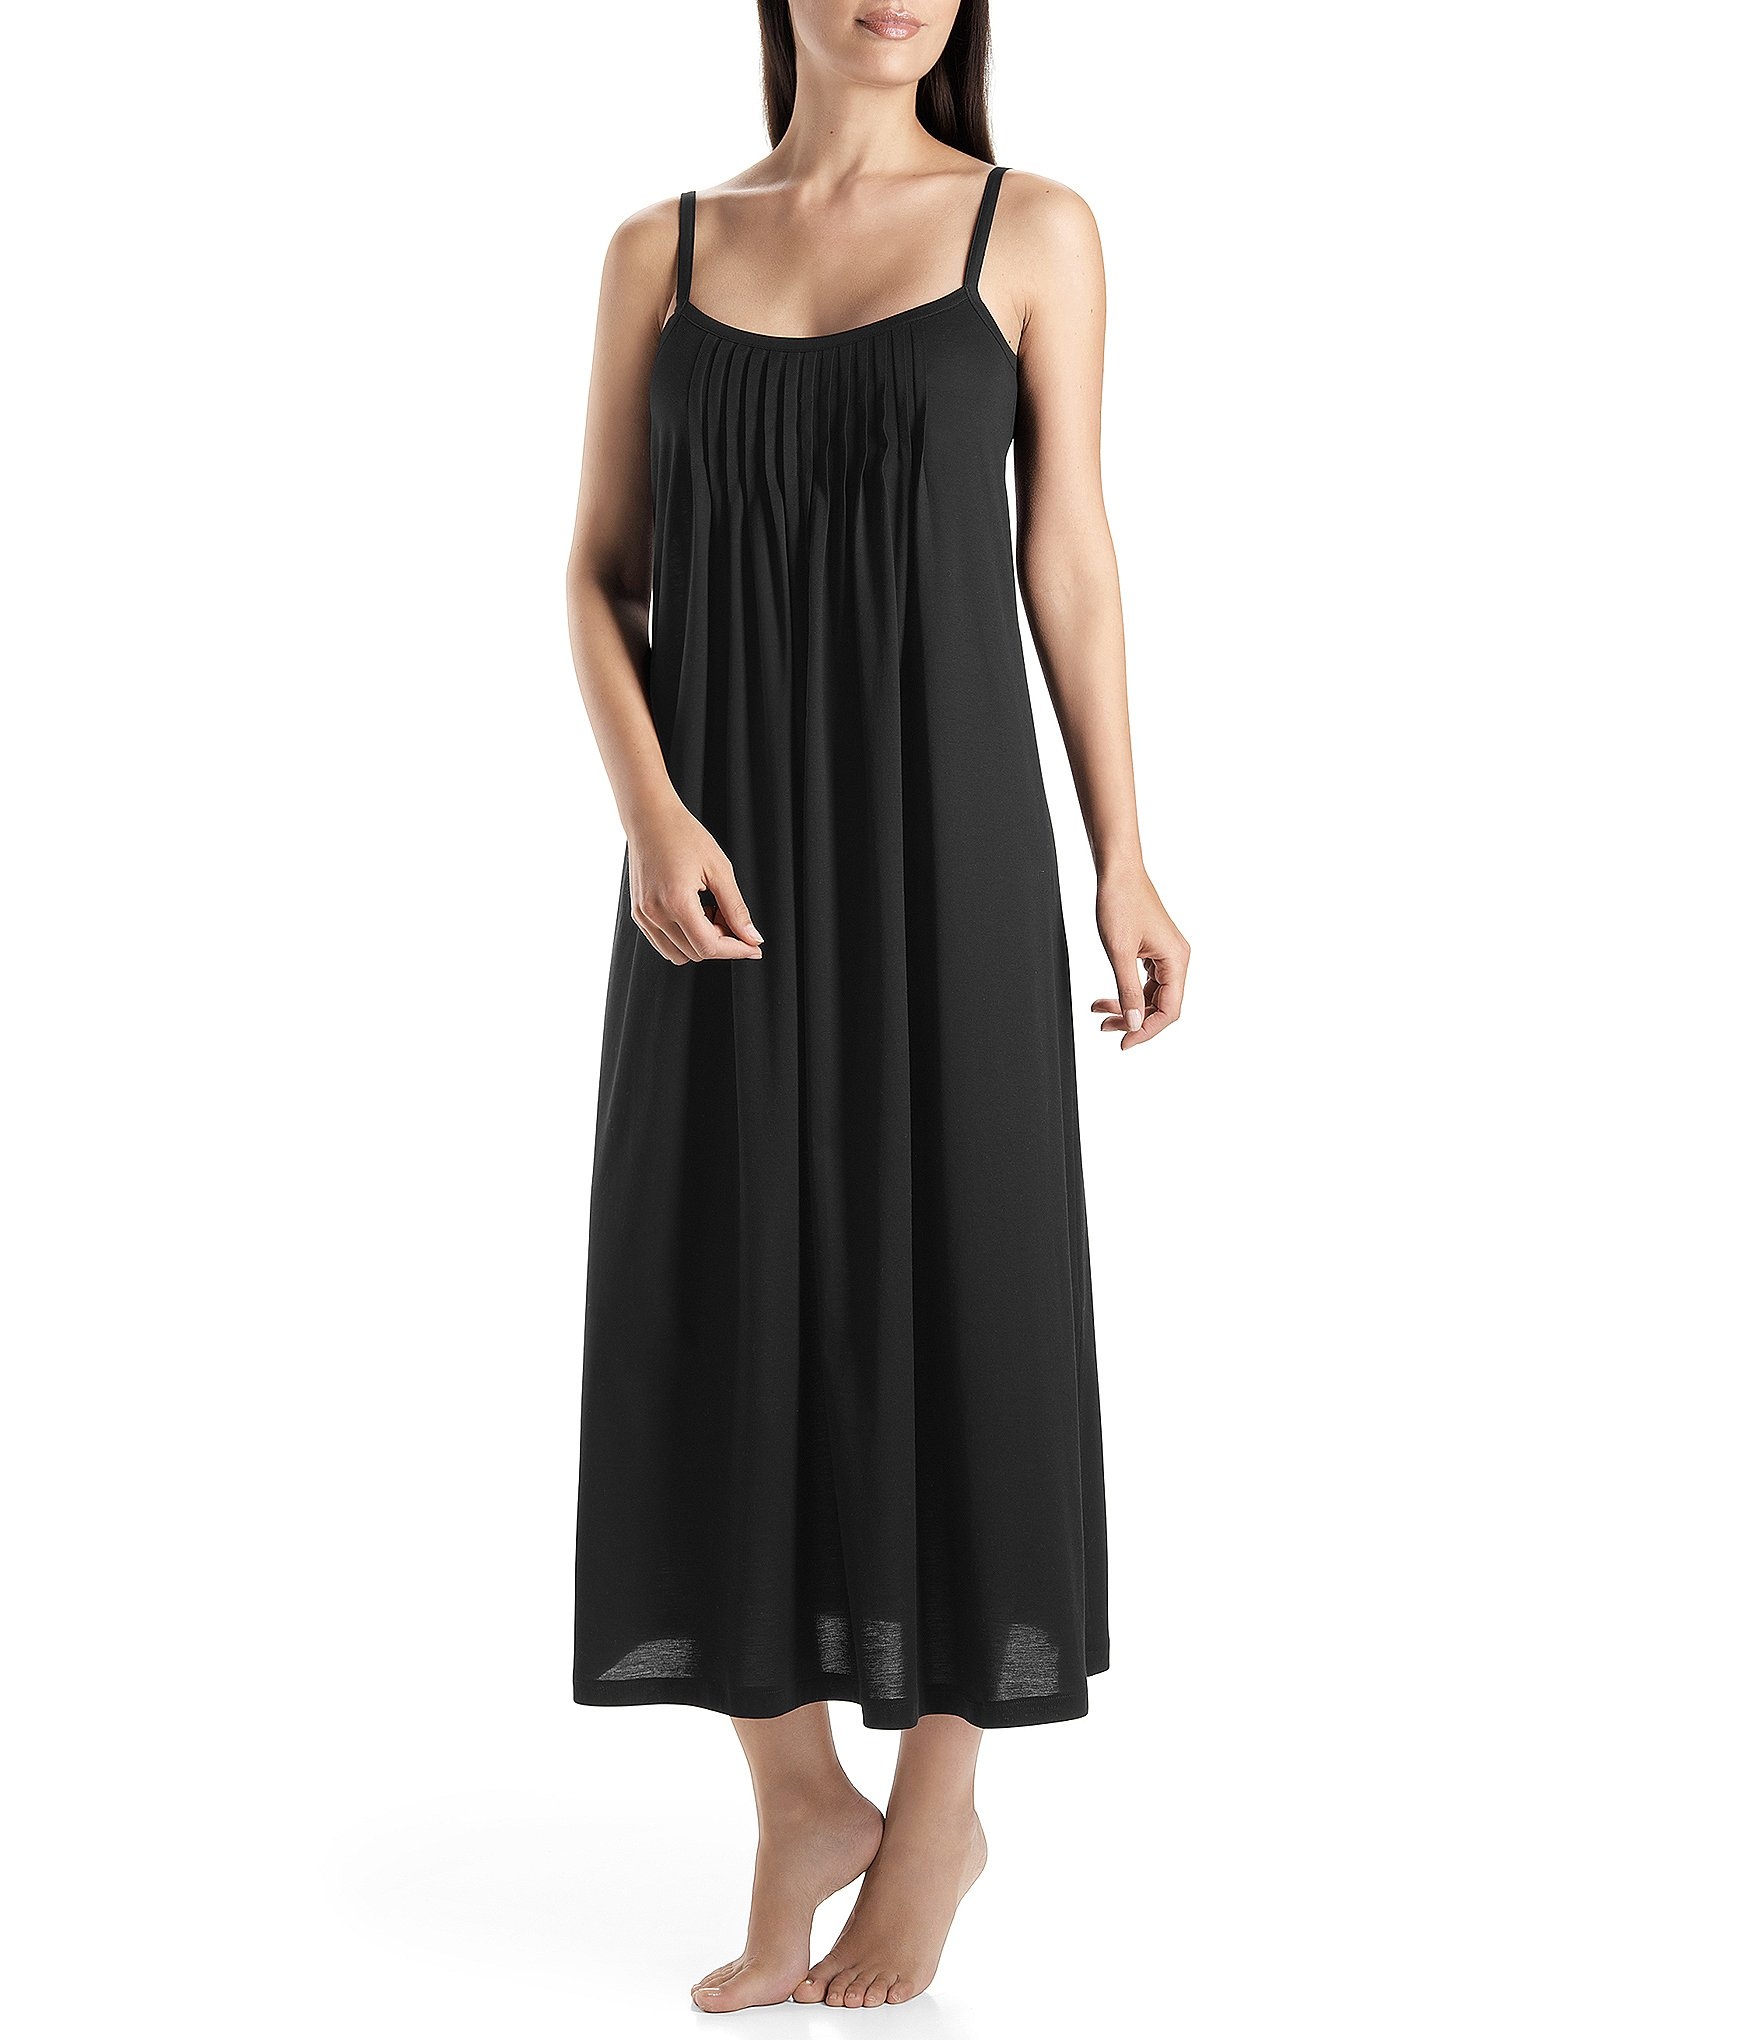 Women\'s Pajamas, Sleepwear & Nightgowns | Dillards